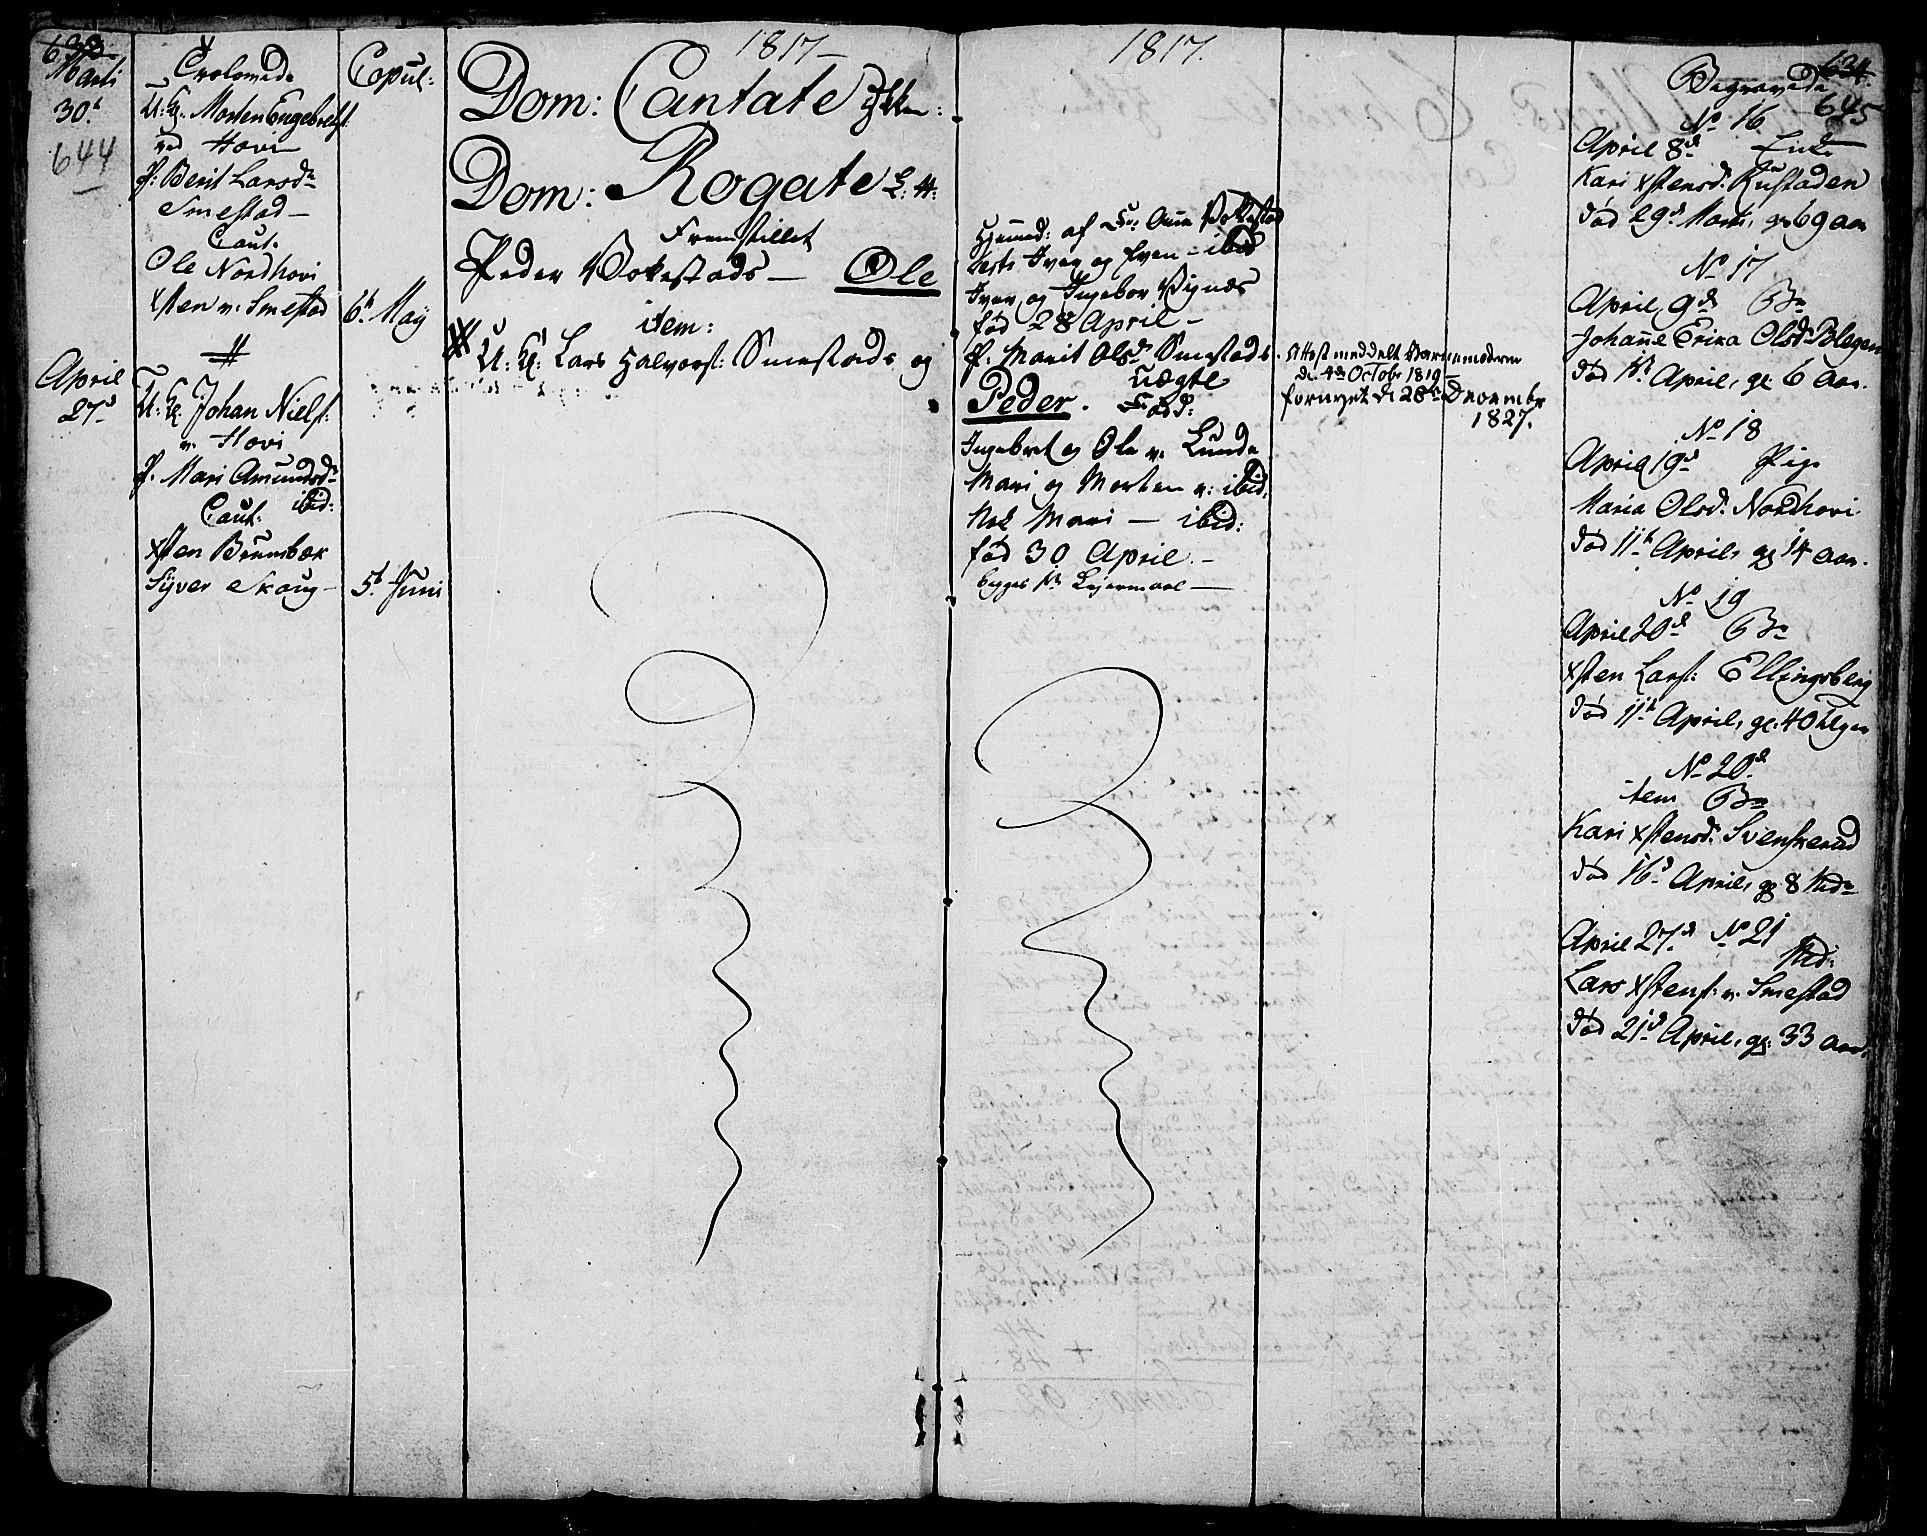 SAH, Fåberg prestekontor, H/Ha/Haa/L0002: Ministerialbok nr. 2, 1775-1818, s. 644-645